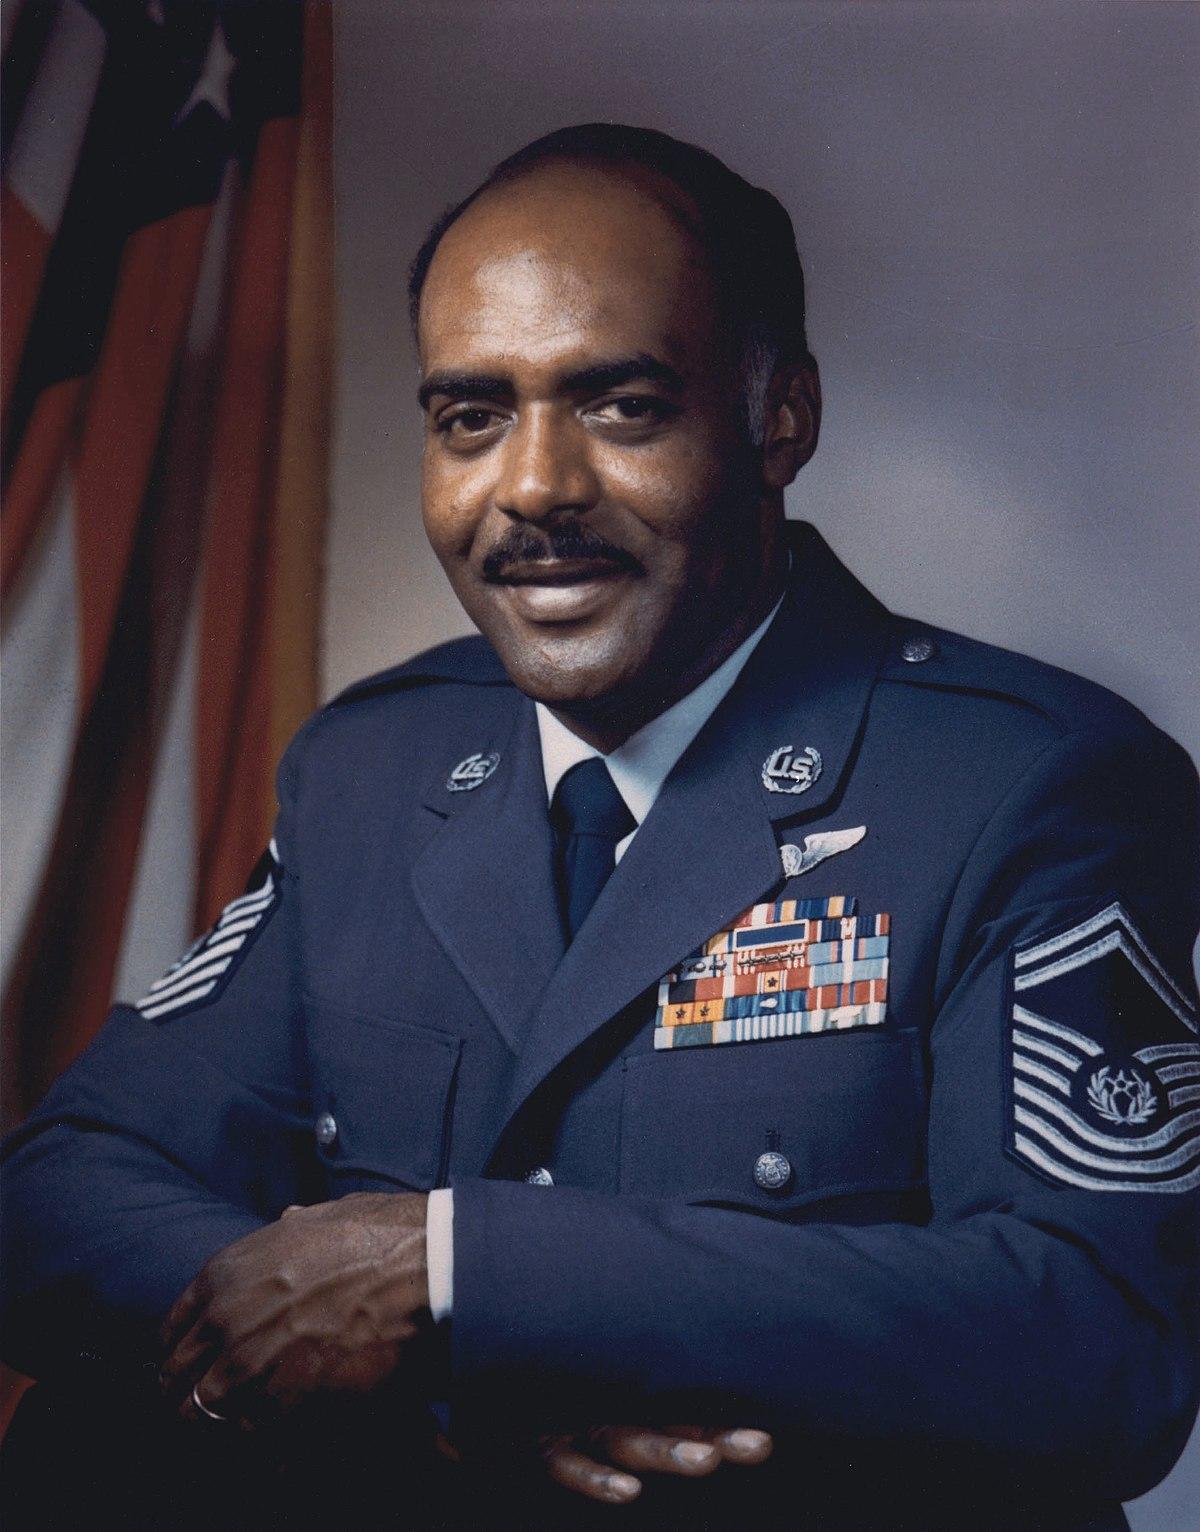 First chief master sergeant